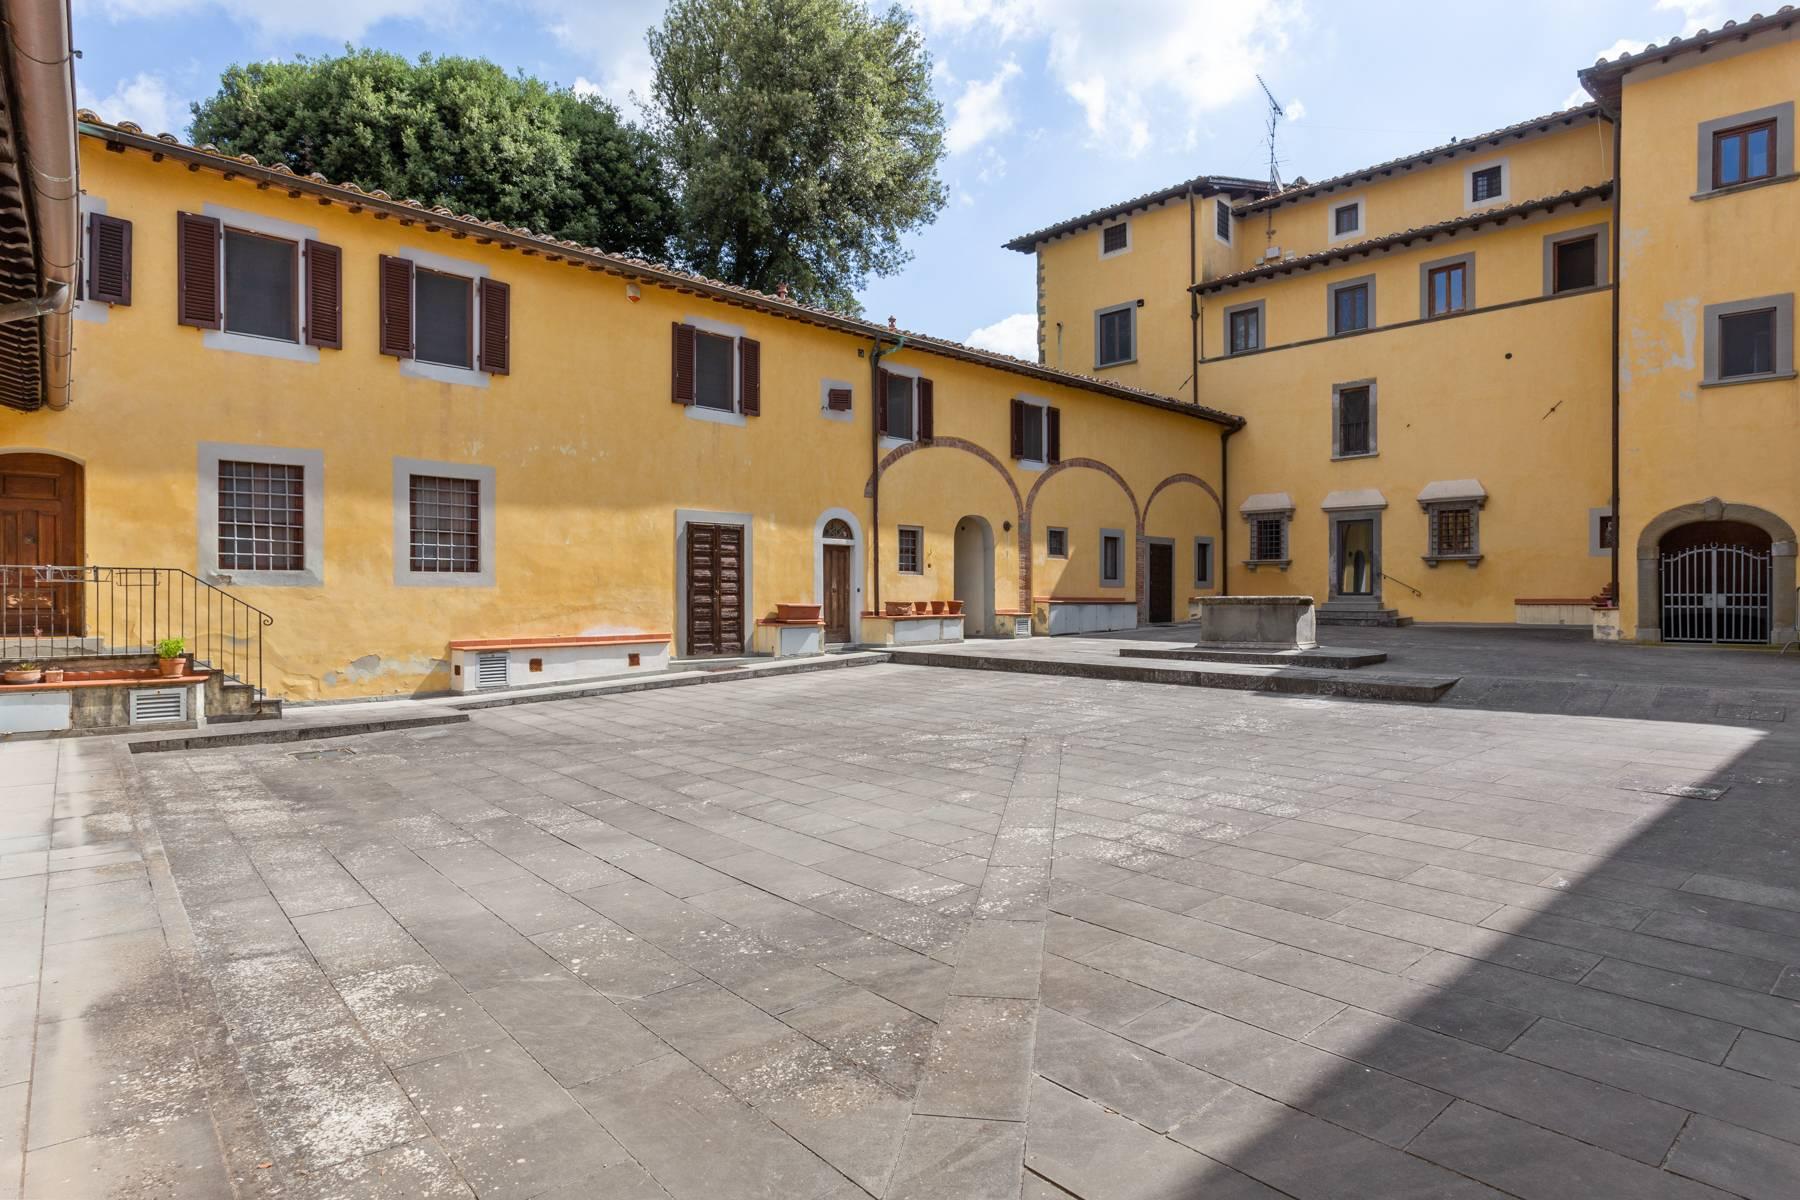 Appartamento in Vendita a Scandicci: 5 locali, 140 mq - Foto 21